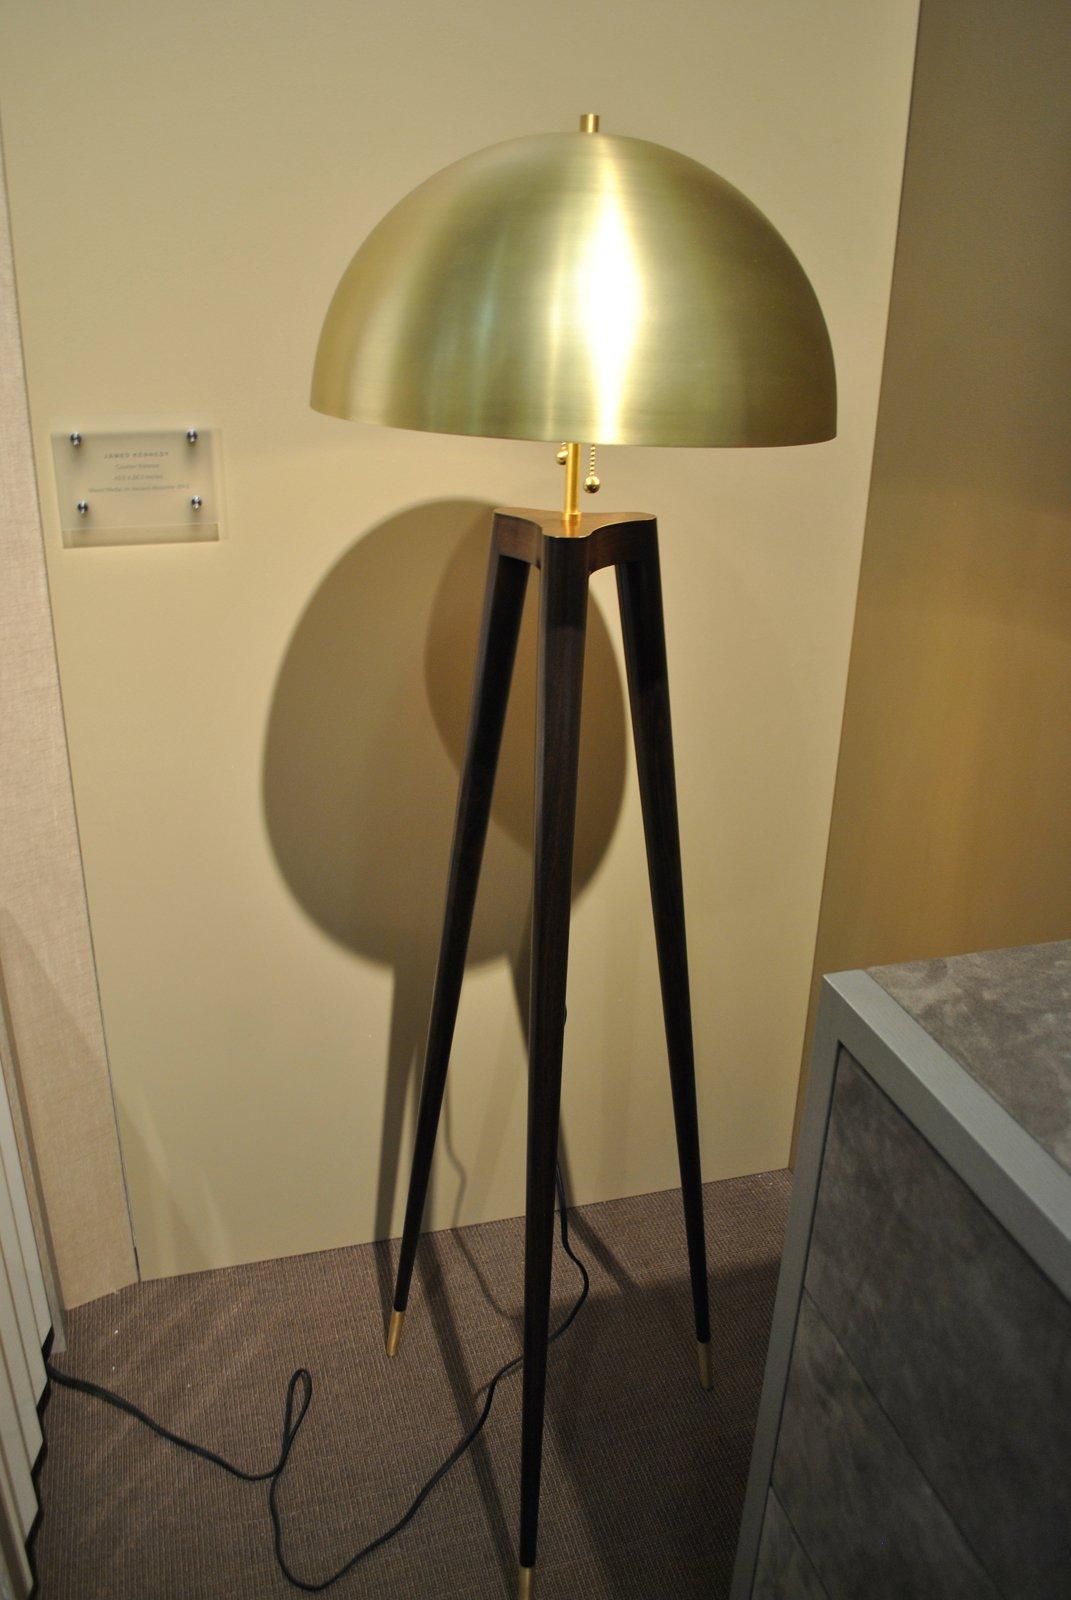 Fire Tripod lamp, with a spun-brass shade, lathe-turned legs and brass feet, by Matthew Fairbank Design.  ICFF 2012: Brass Tactics by Amanda Dameron